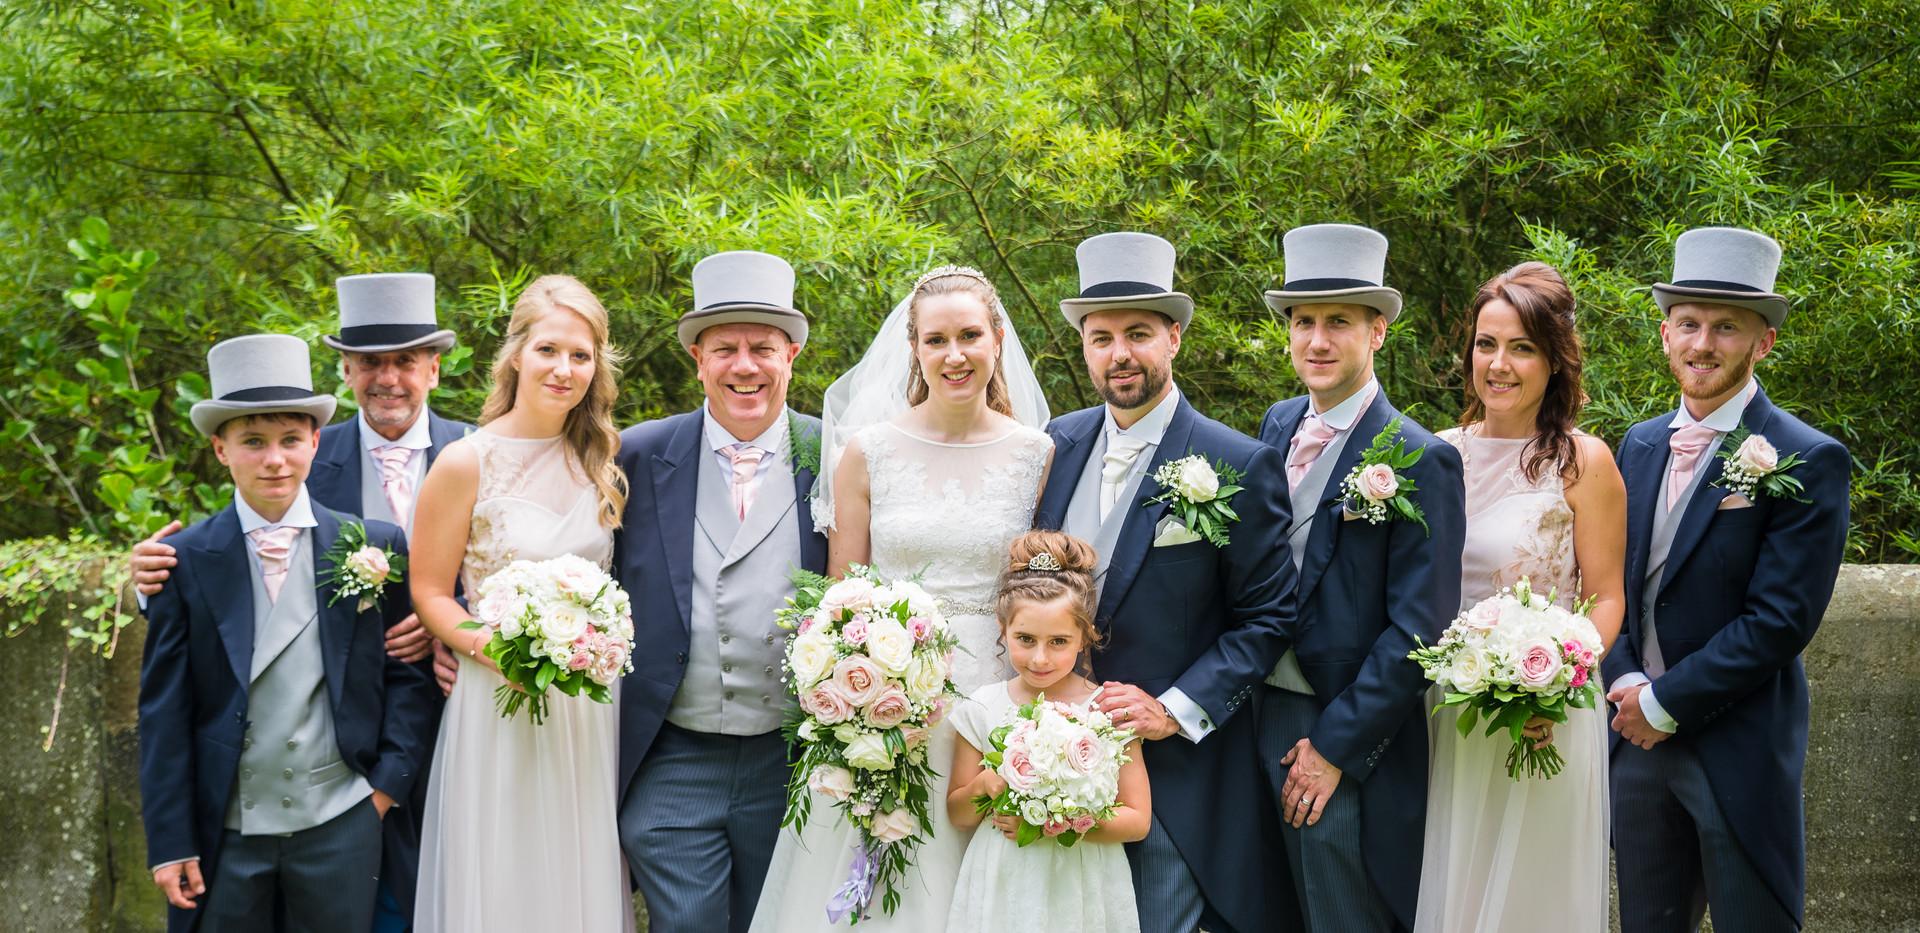 Oddfellows Wedding Photography___16.jpg